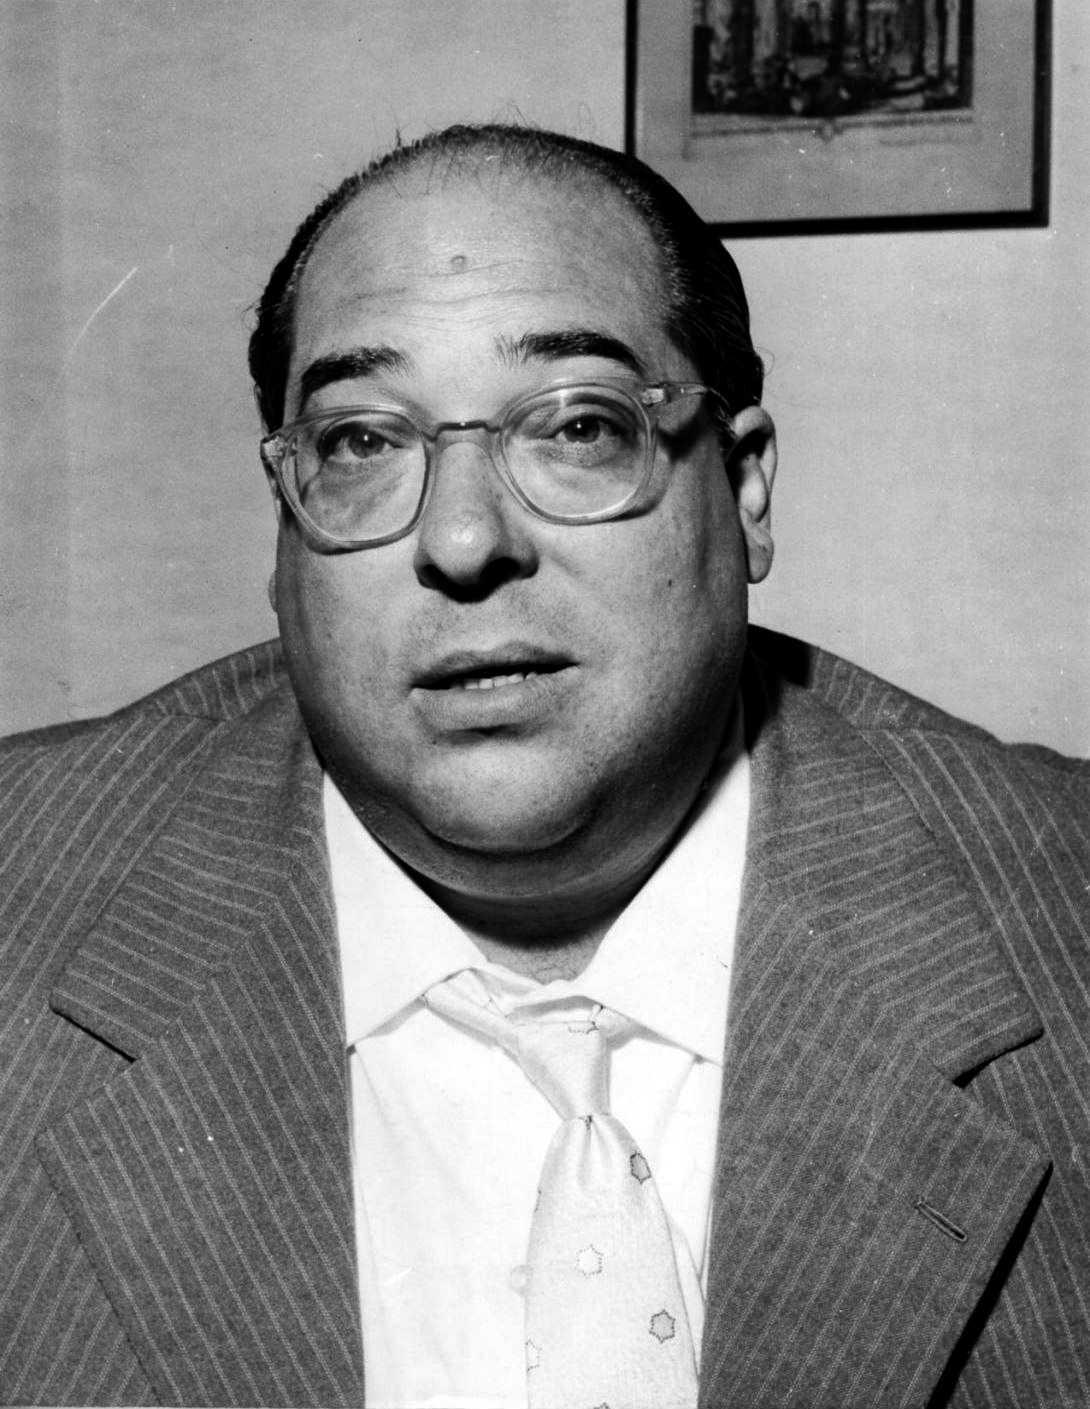 Gaddo Treves (ca. 1958)